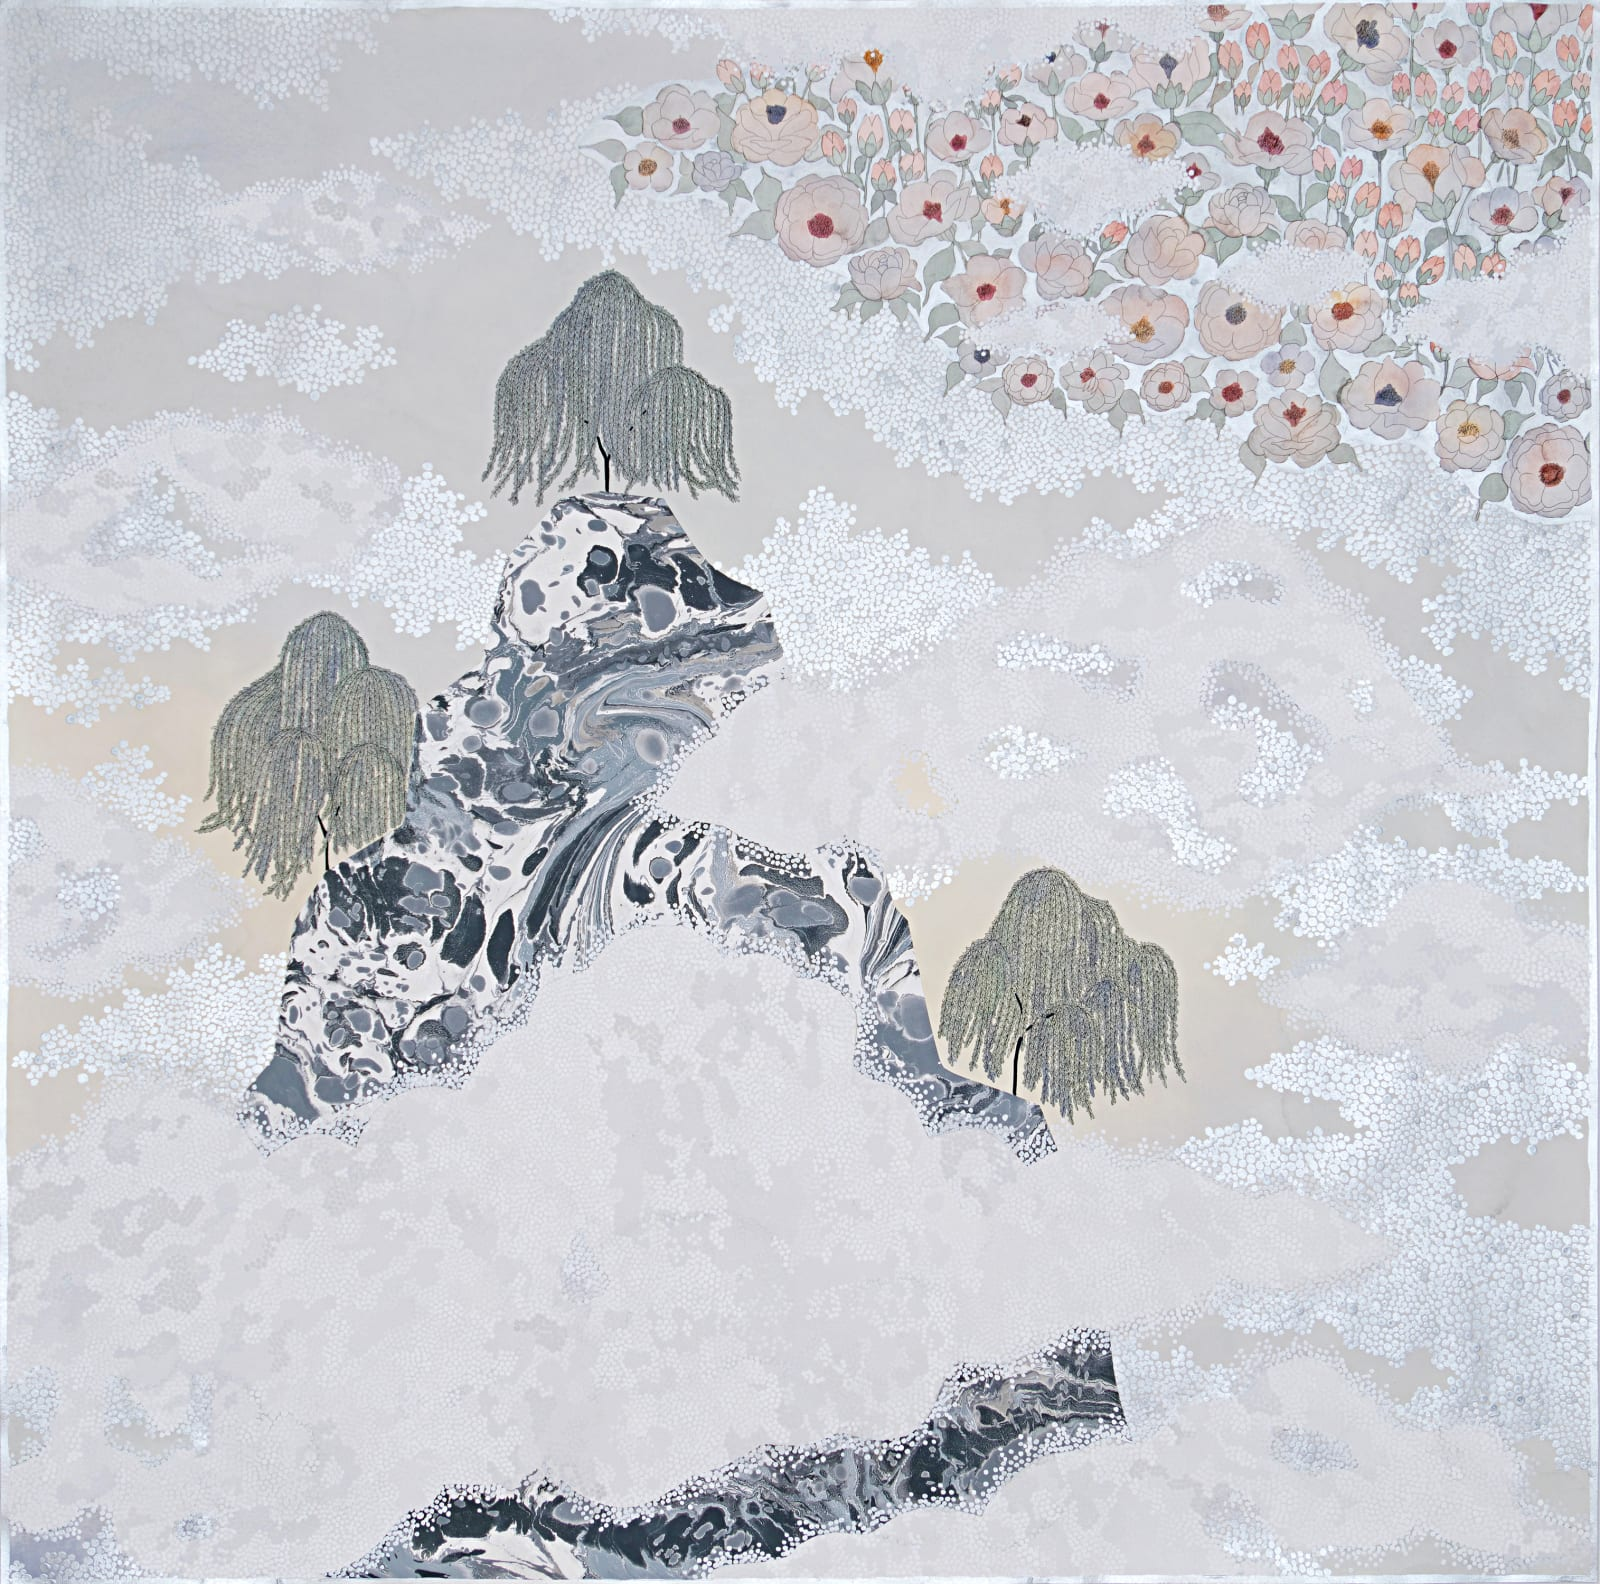 Crystal Liu, the fog, 'watch over me', 2019